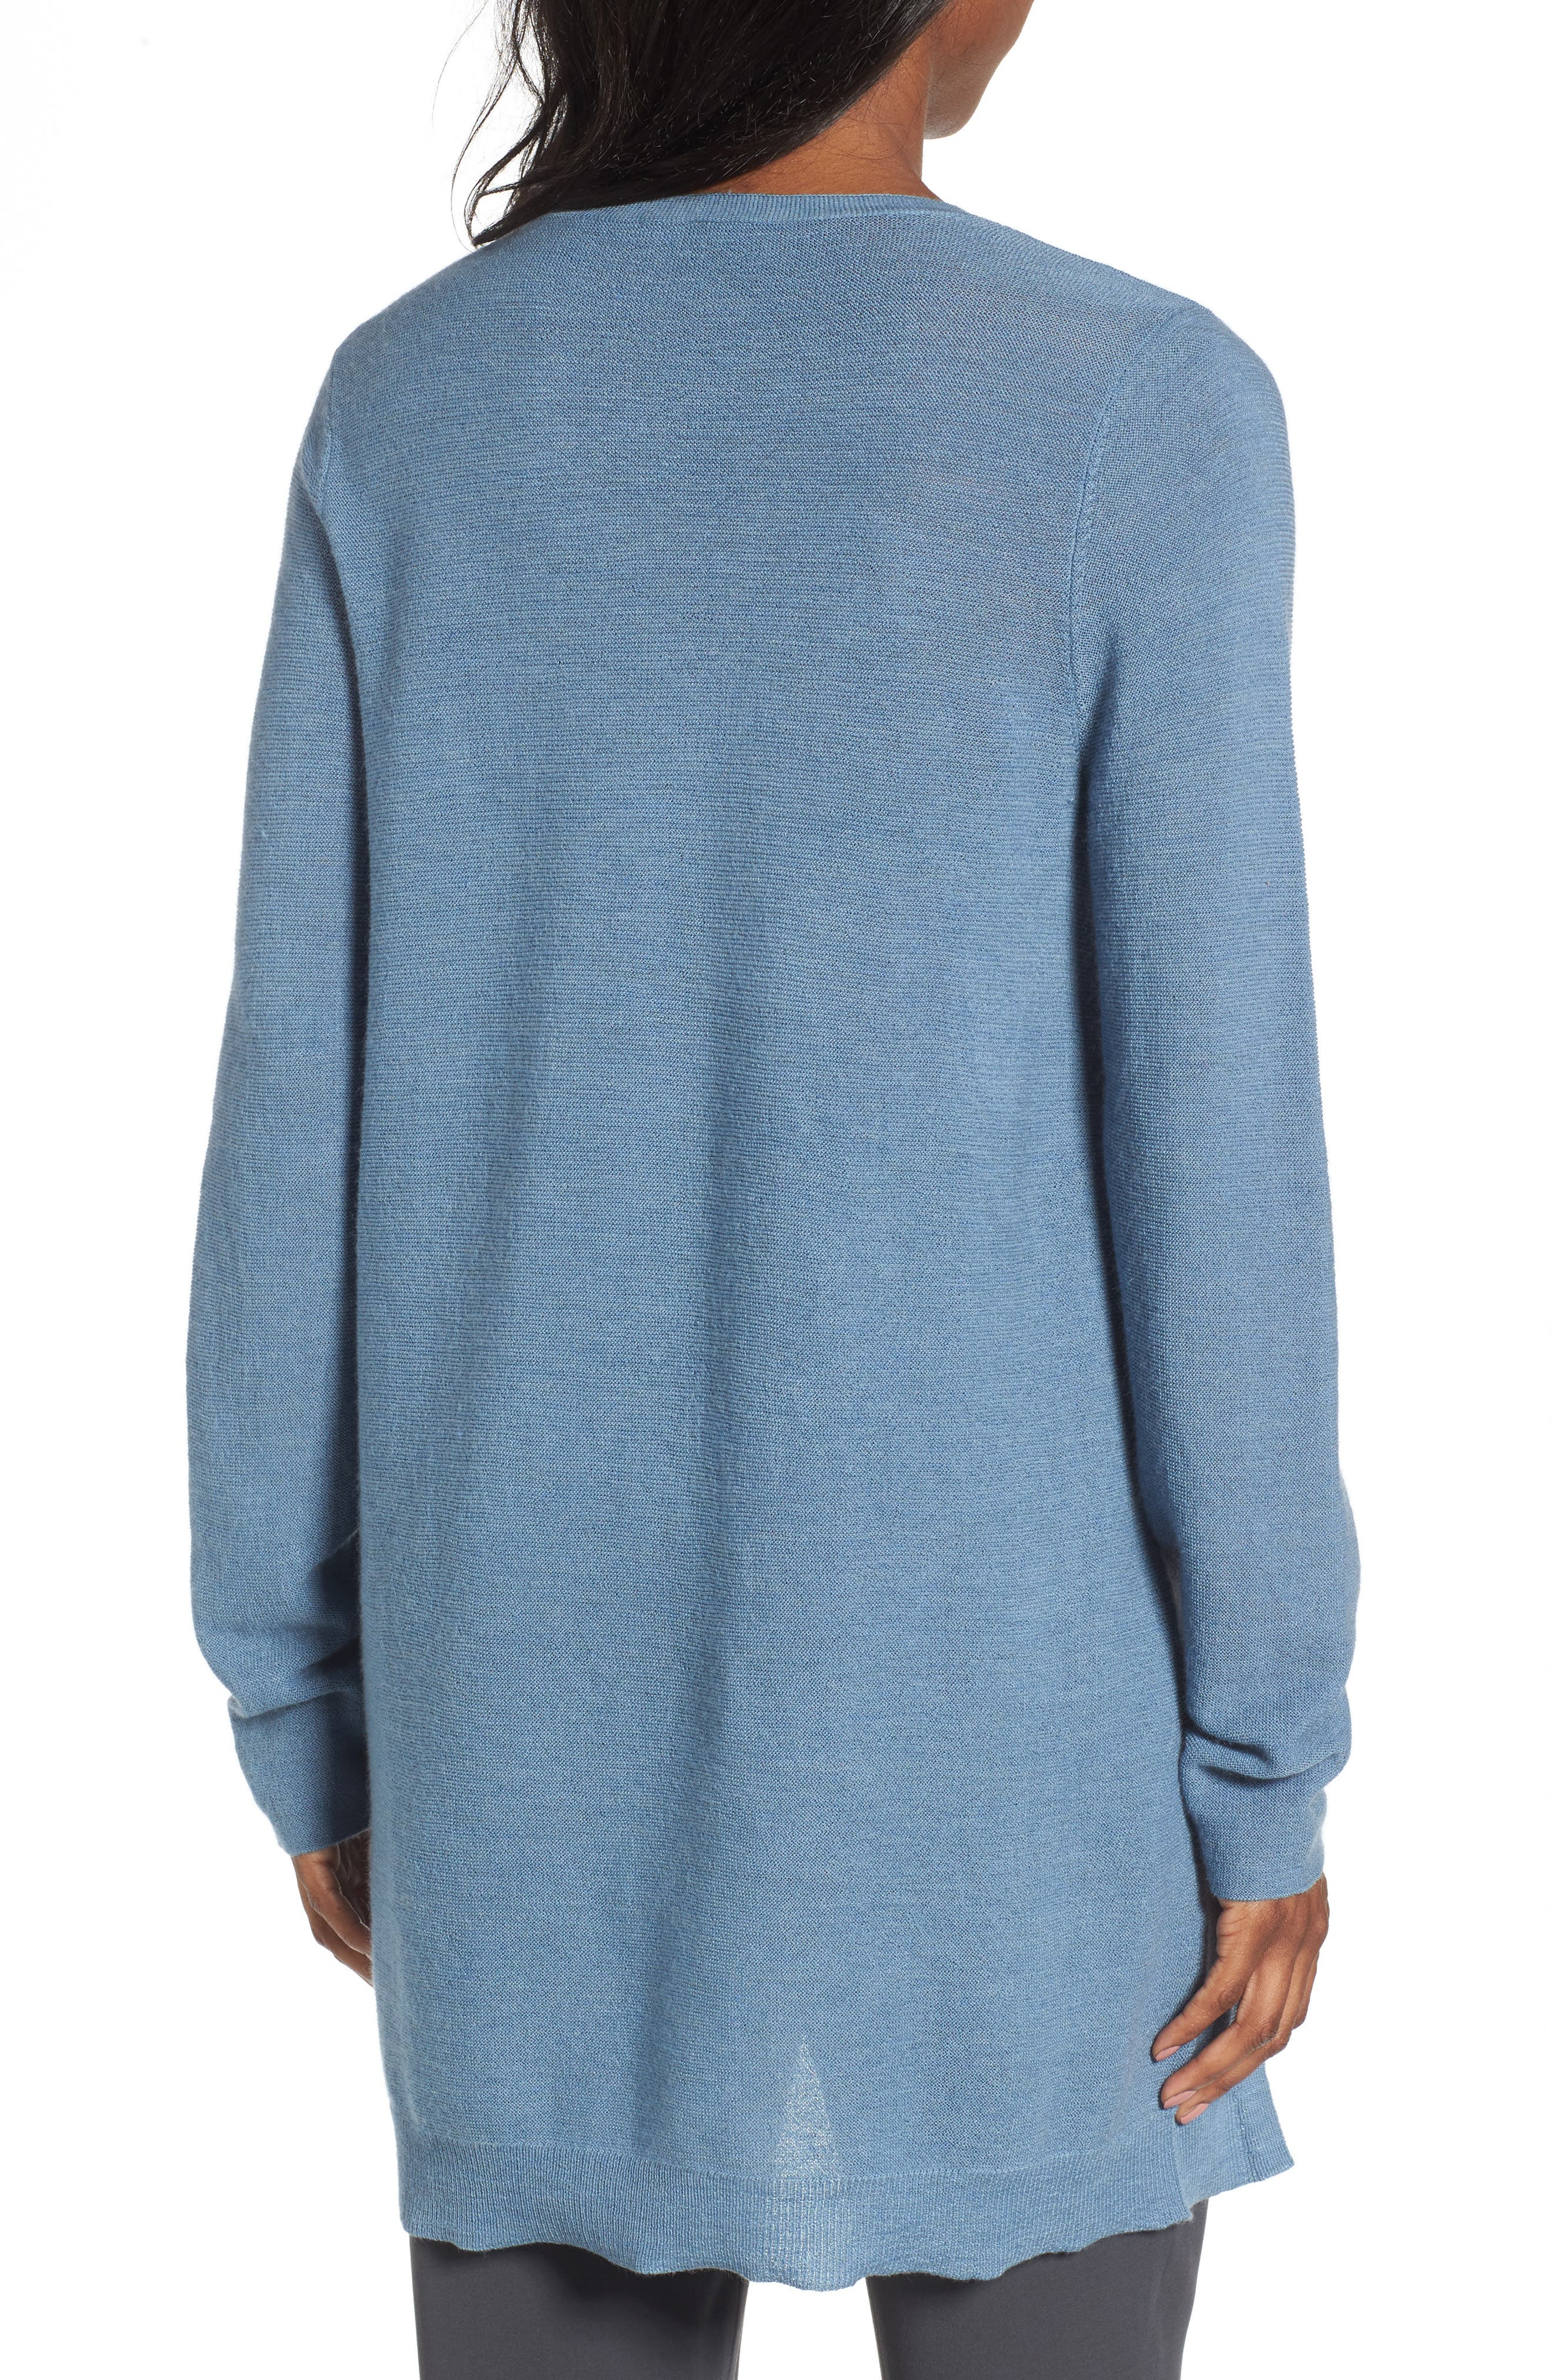 Alternate Image 2  - Eileen Fisher High/Low Merino Wool Sweater